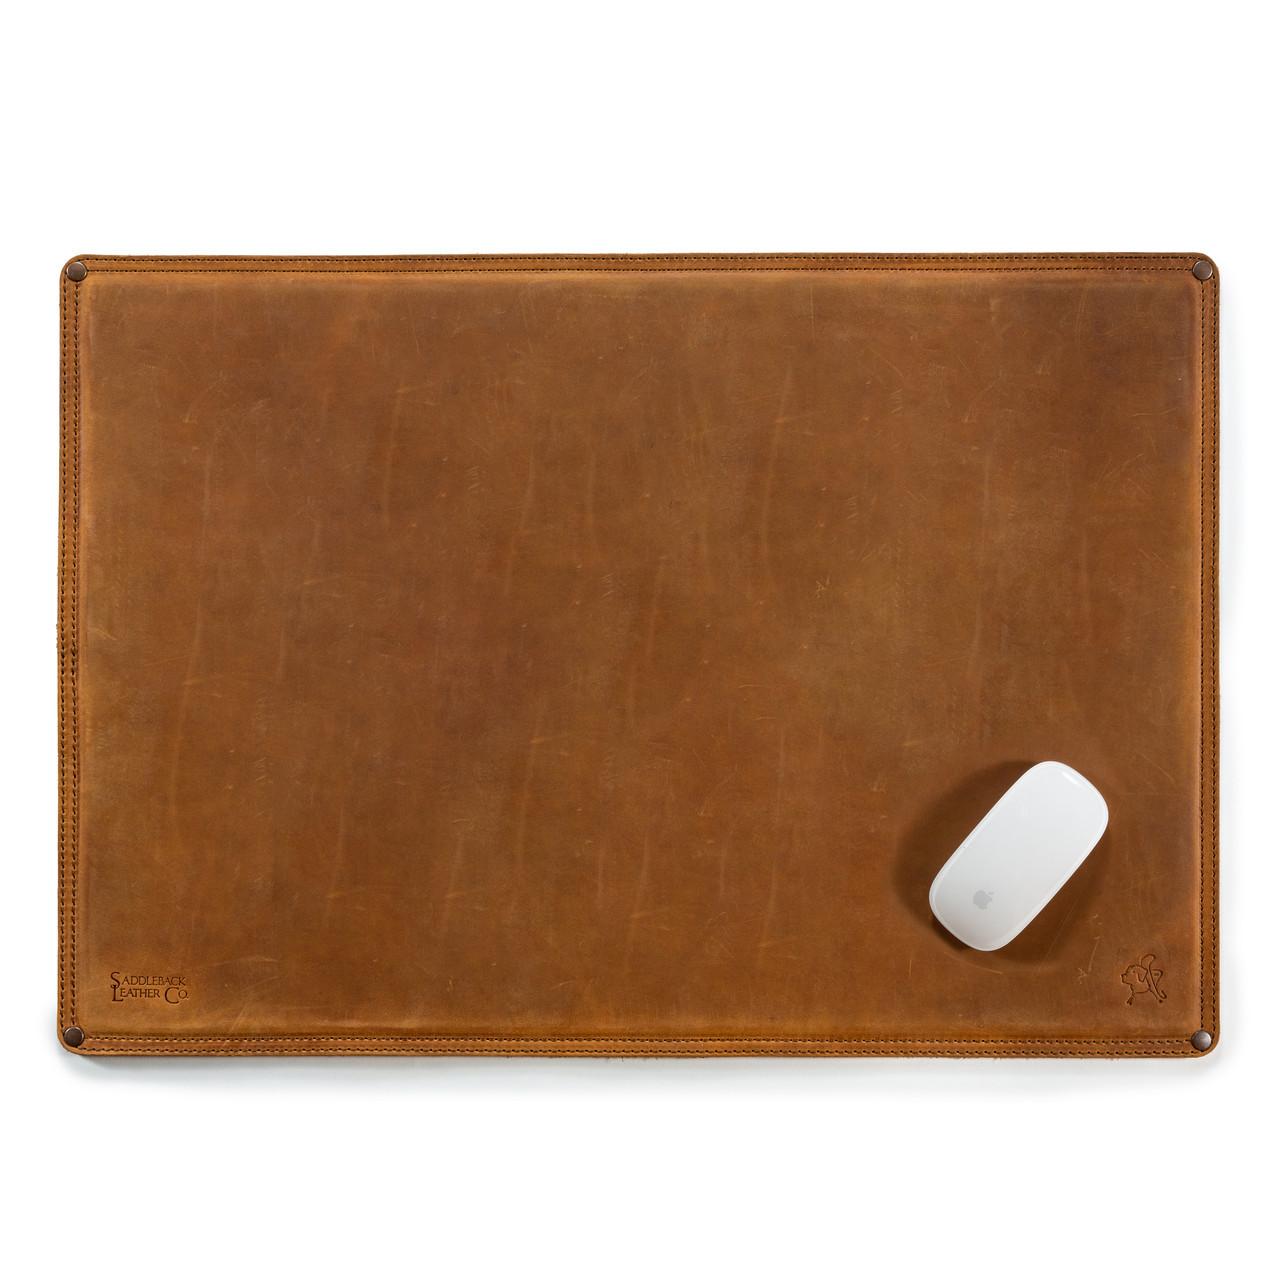 Leather Desk Pad Real Genuine Full Grain Blotter Saddleback Leather